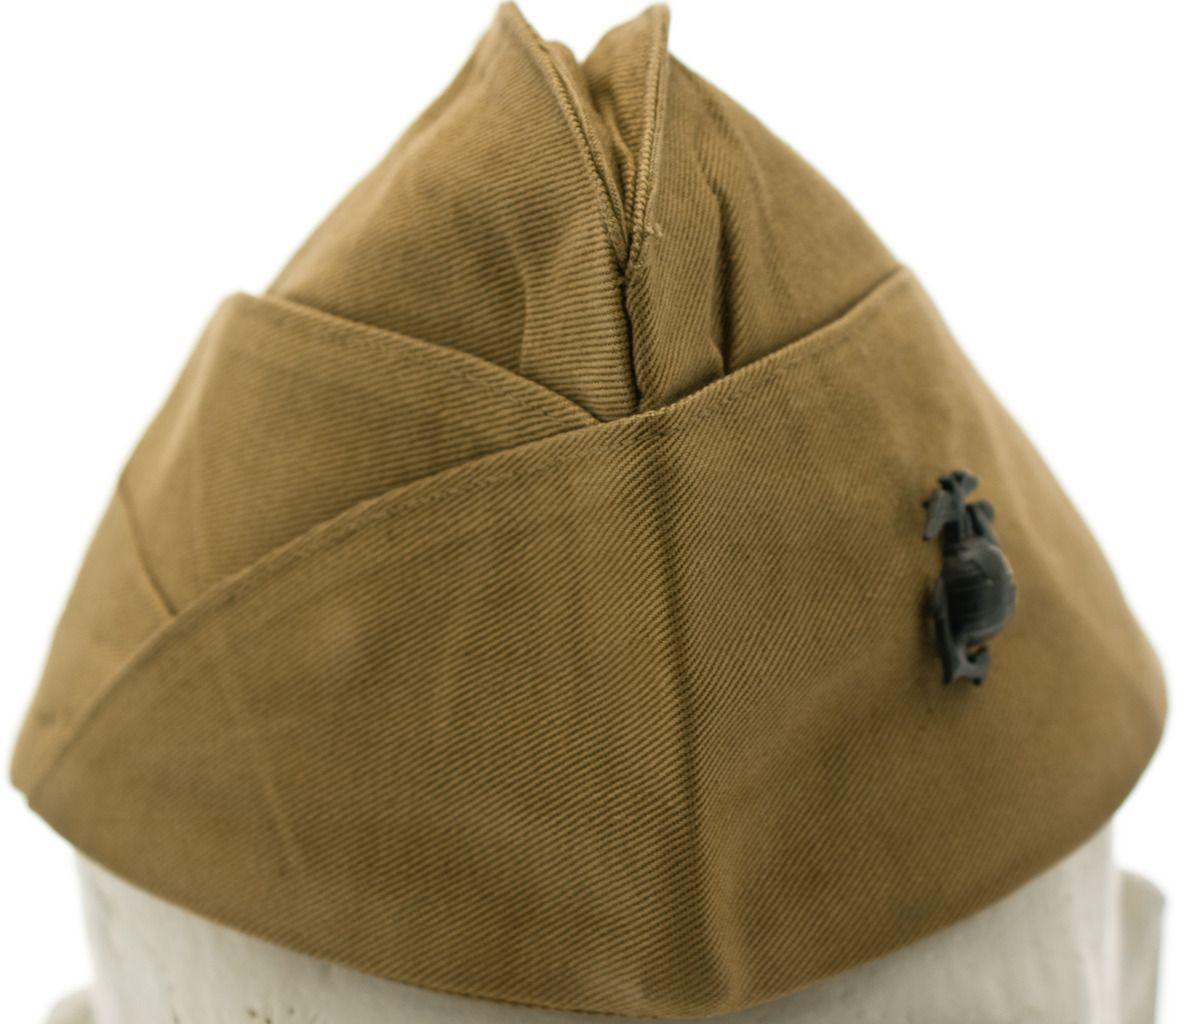 u s marine corps world war ii garrison cap usmc semper fi